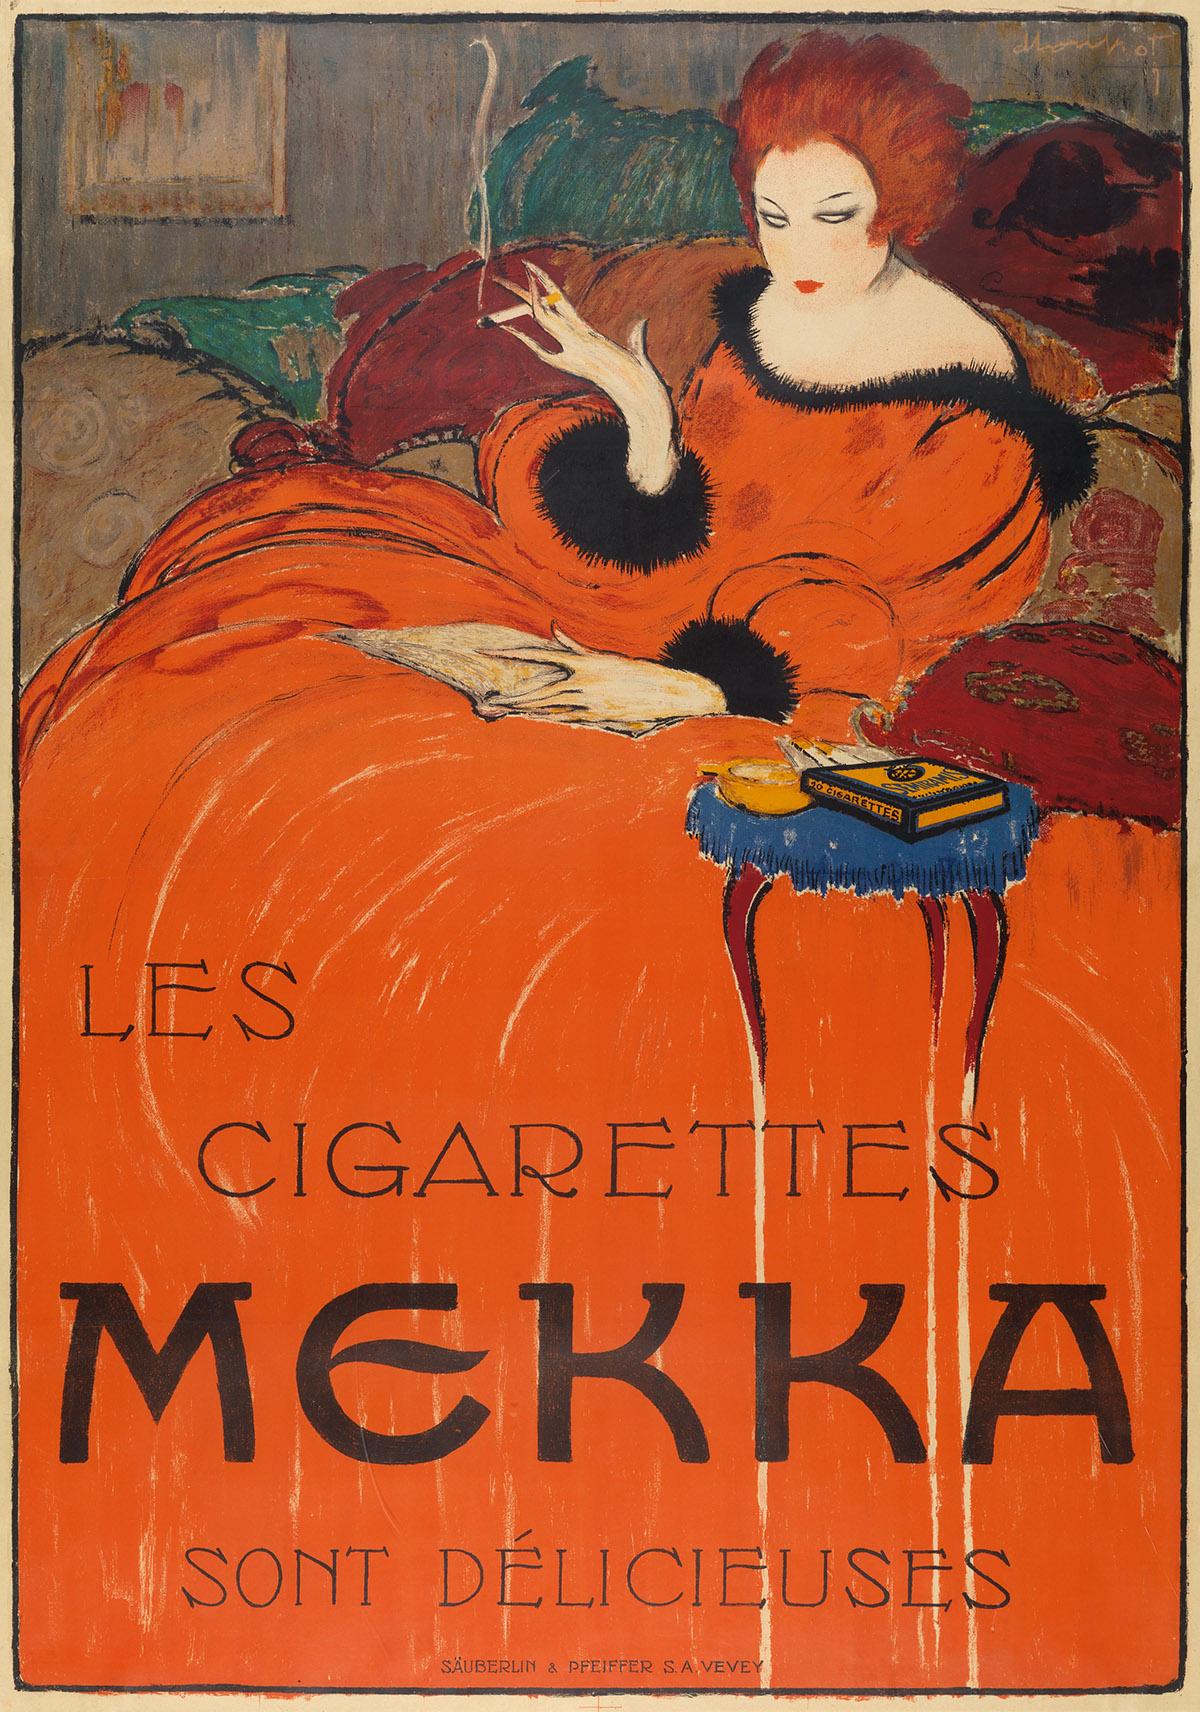 CHARLES LOUPOT (1892-1962). LES CIGARETTES MEKKA. 1919. 50x35 inches, 129x90 cm. Säuberlinn & Pfeiffer, Vevey.